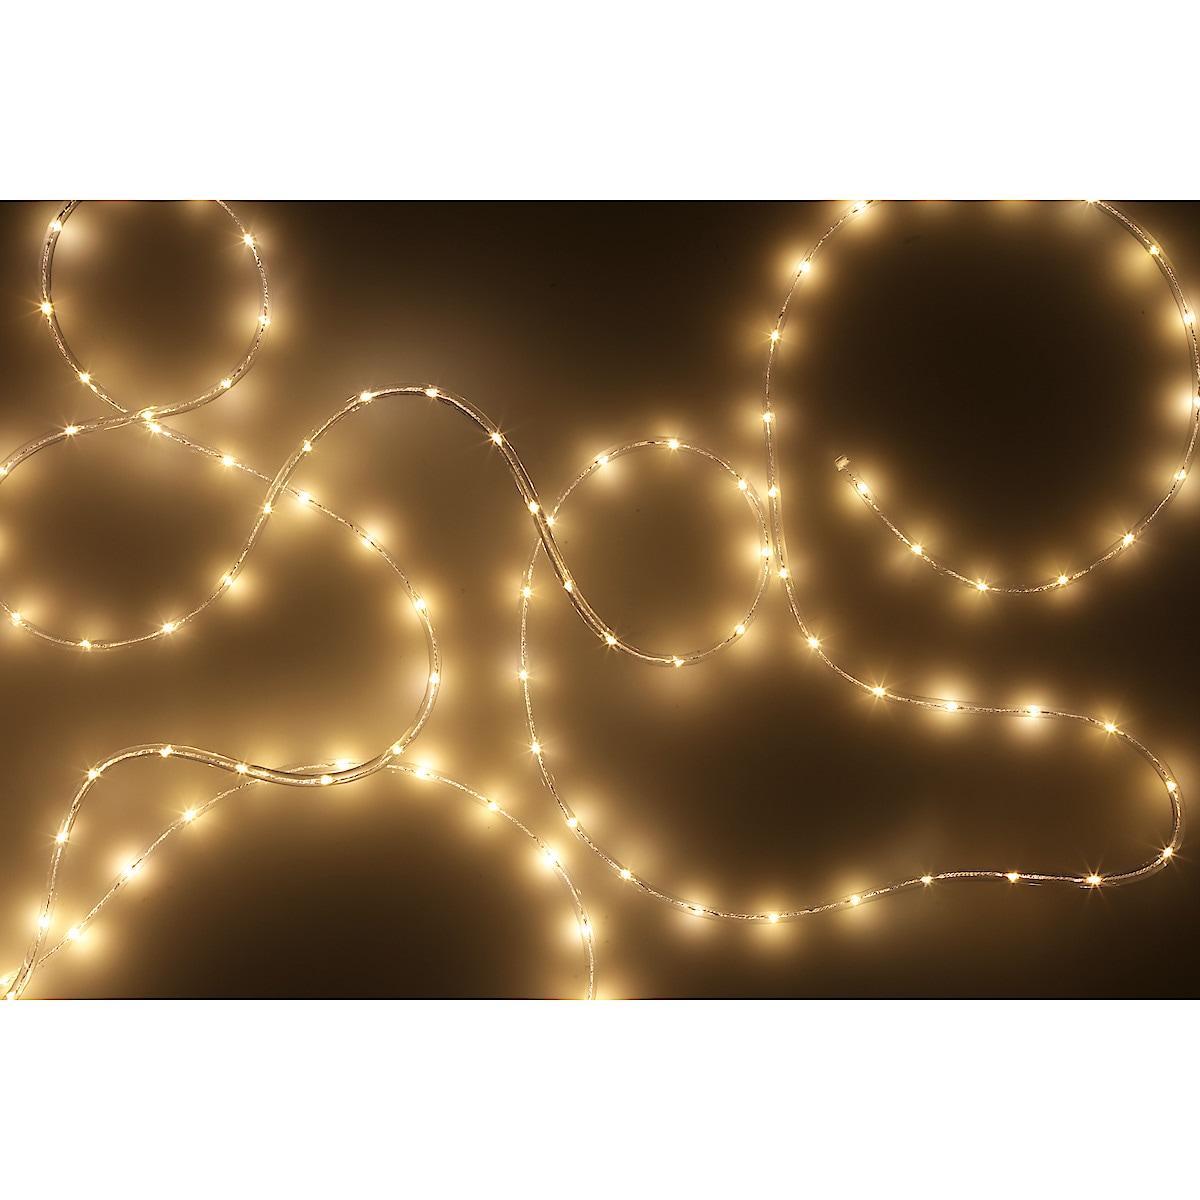 LED-ljusslang Ebba, Northlight